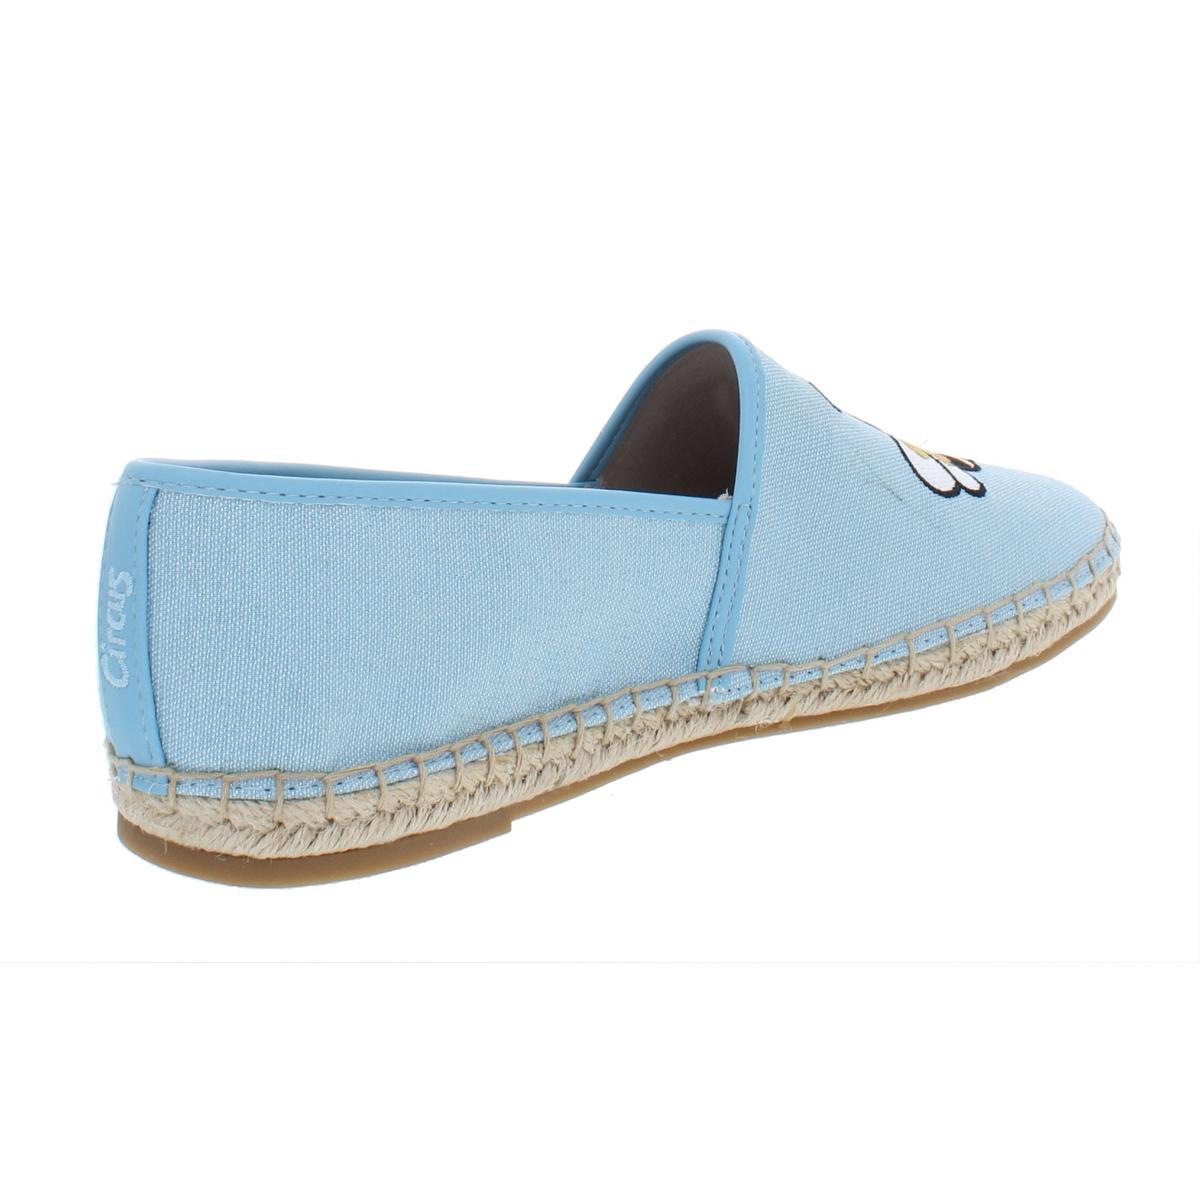 Circus-by-Sam-Edelman-Womens-Leni-6-Canvas-Slip-On-Loafer-Flats-Shoes-BHFO-4603 thumbnail 6